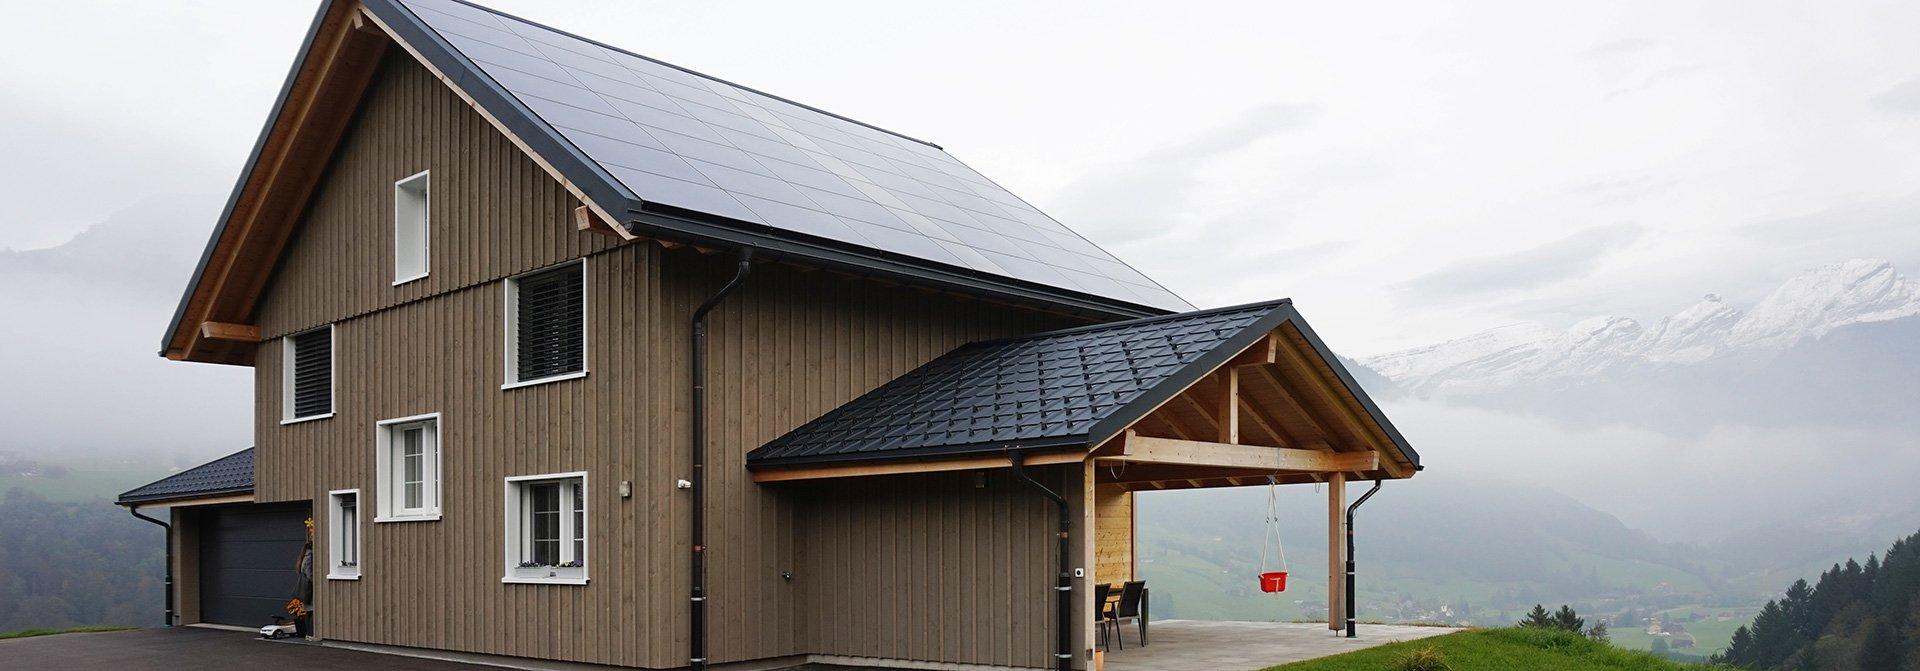 Einfamilienhaus mit Photovoltaikanlage